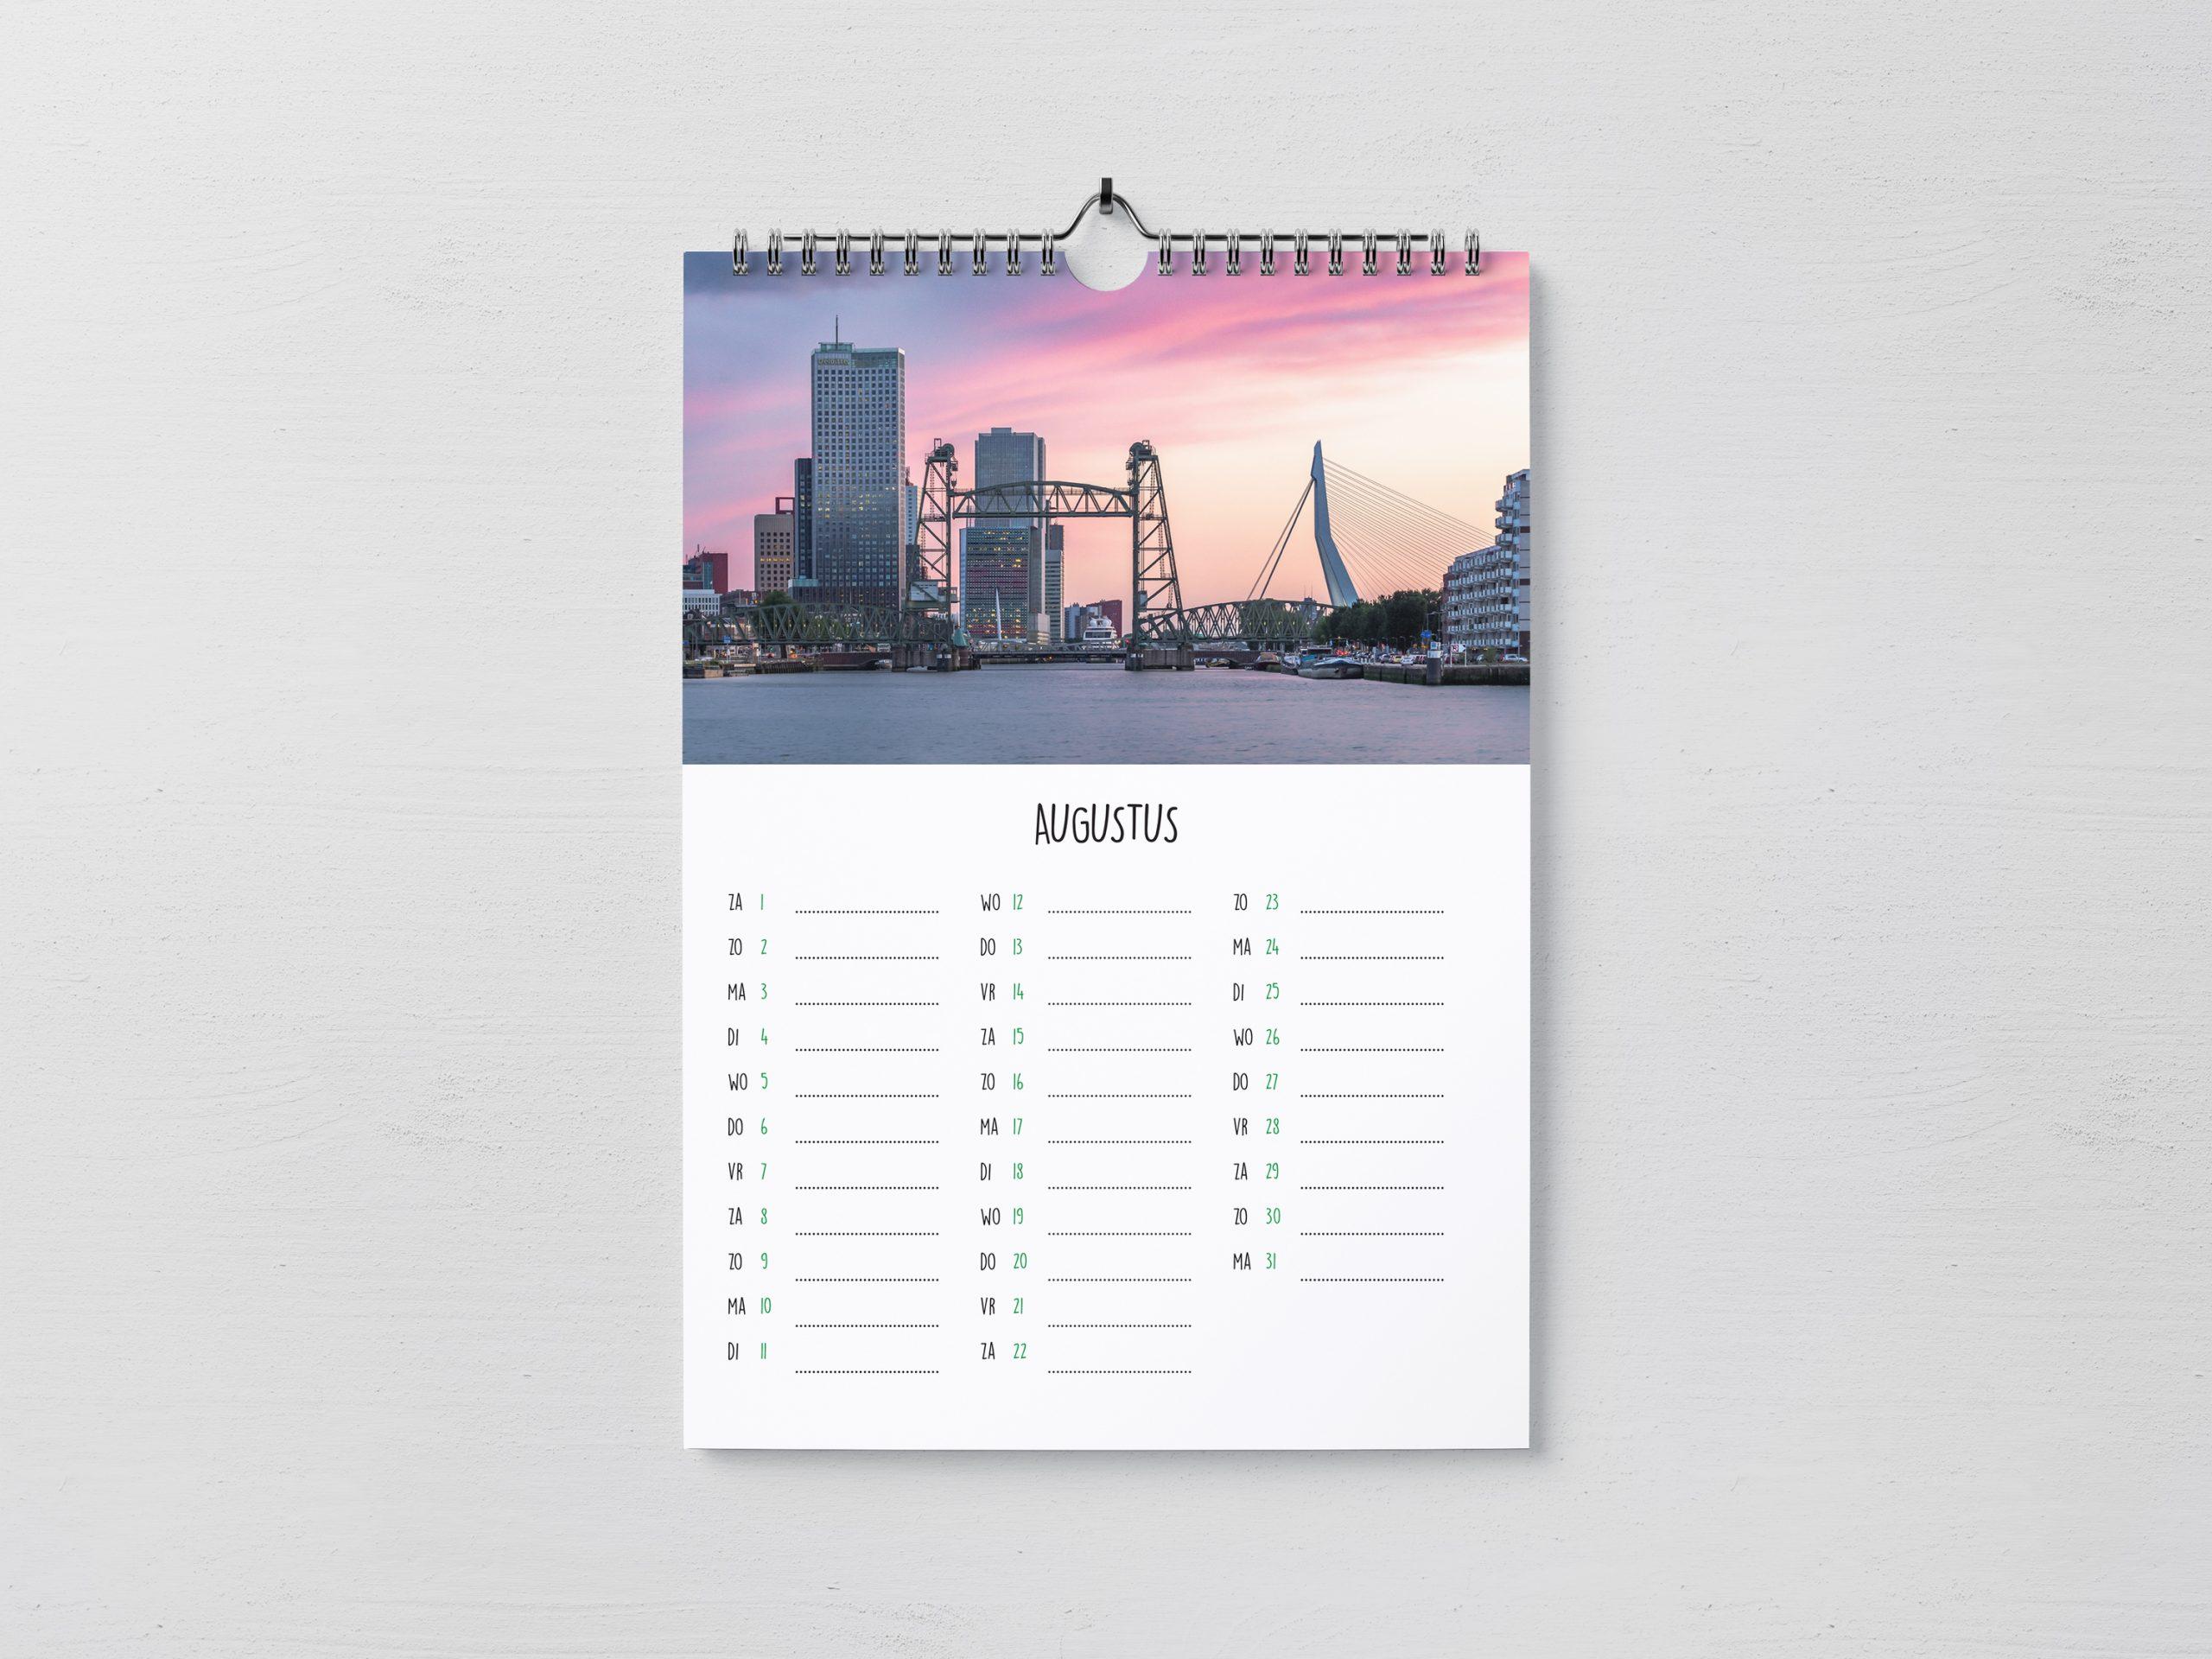 Rotterdam Kalender 2020 maand Augustus